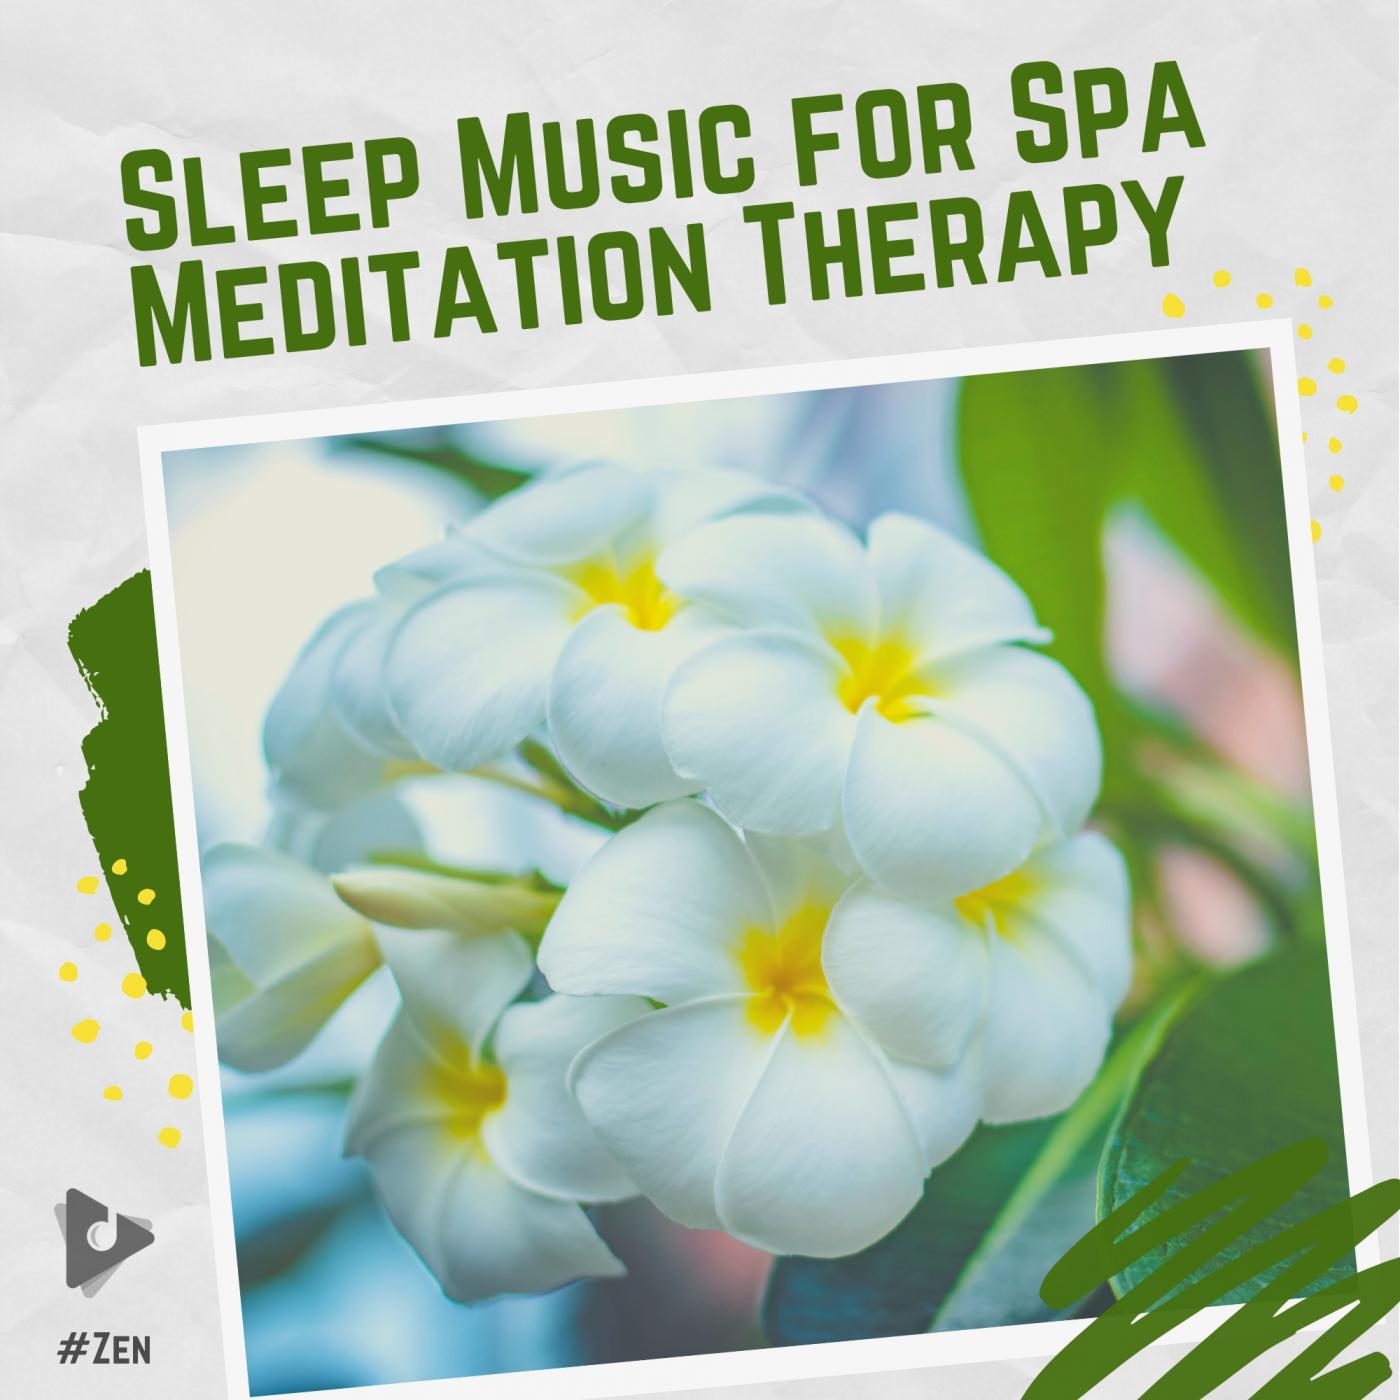 Sleep Music for Spa Meditation Therapy